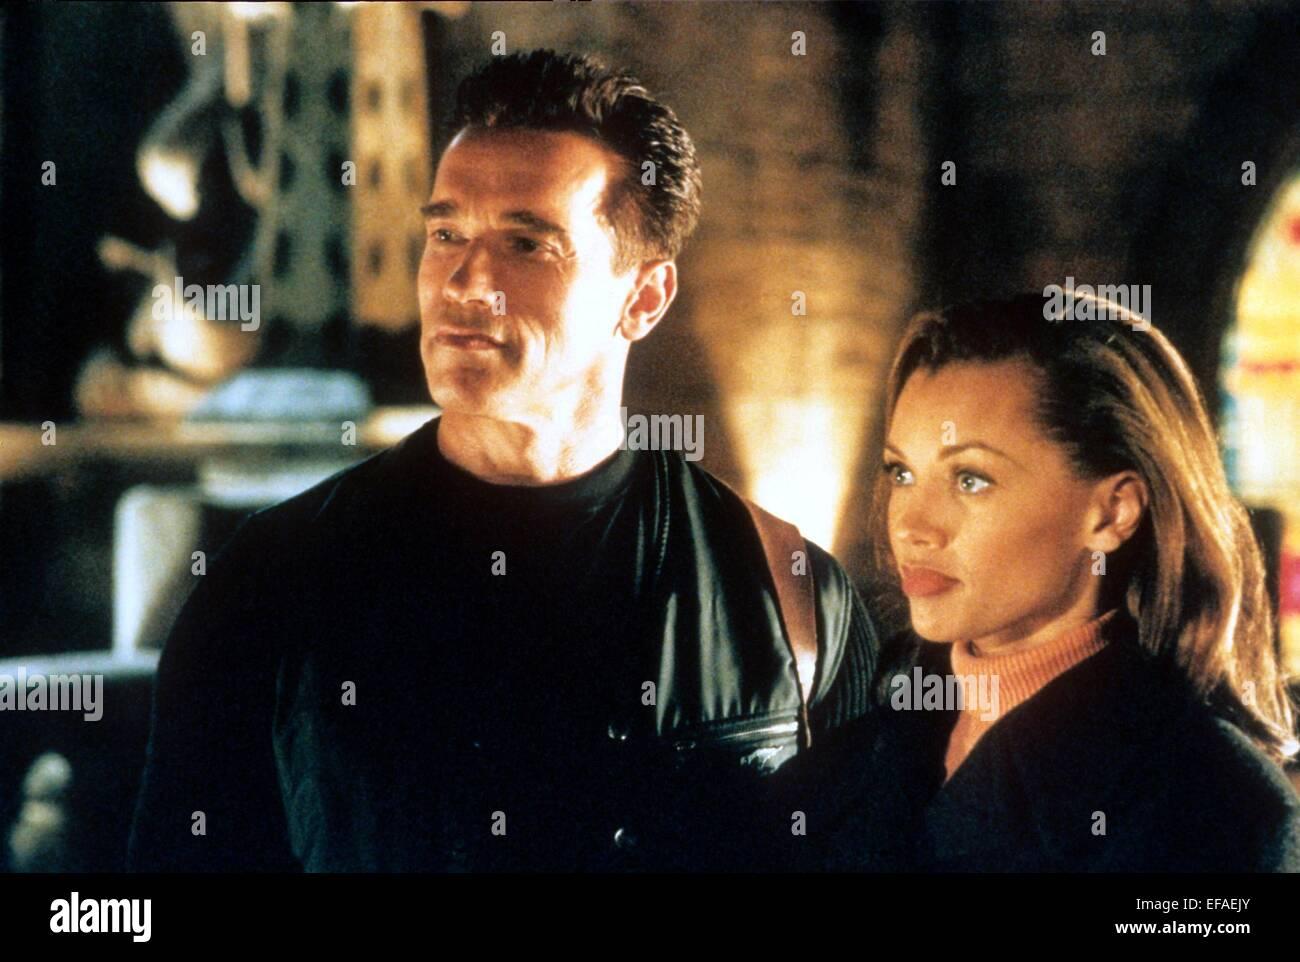 Arnold Schwarzenegger Vanessa Williams Eraser 1996 Stock Photo Alamy